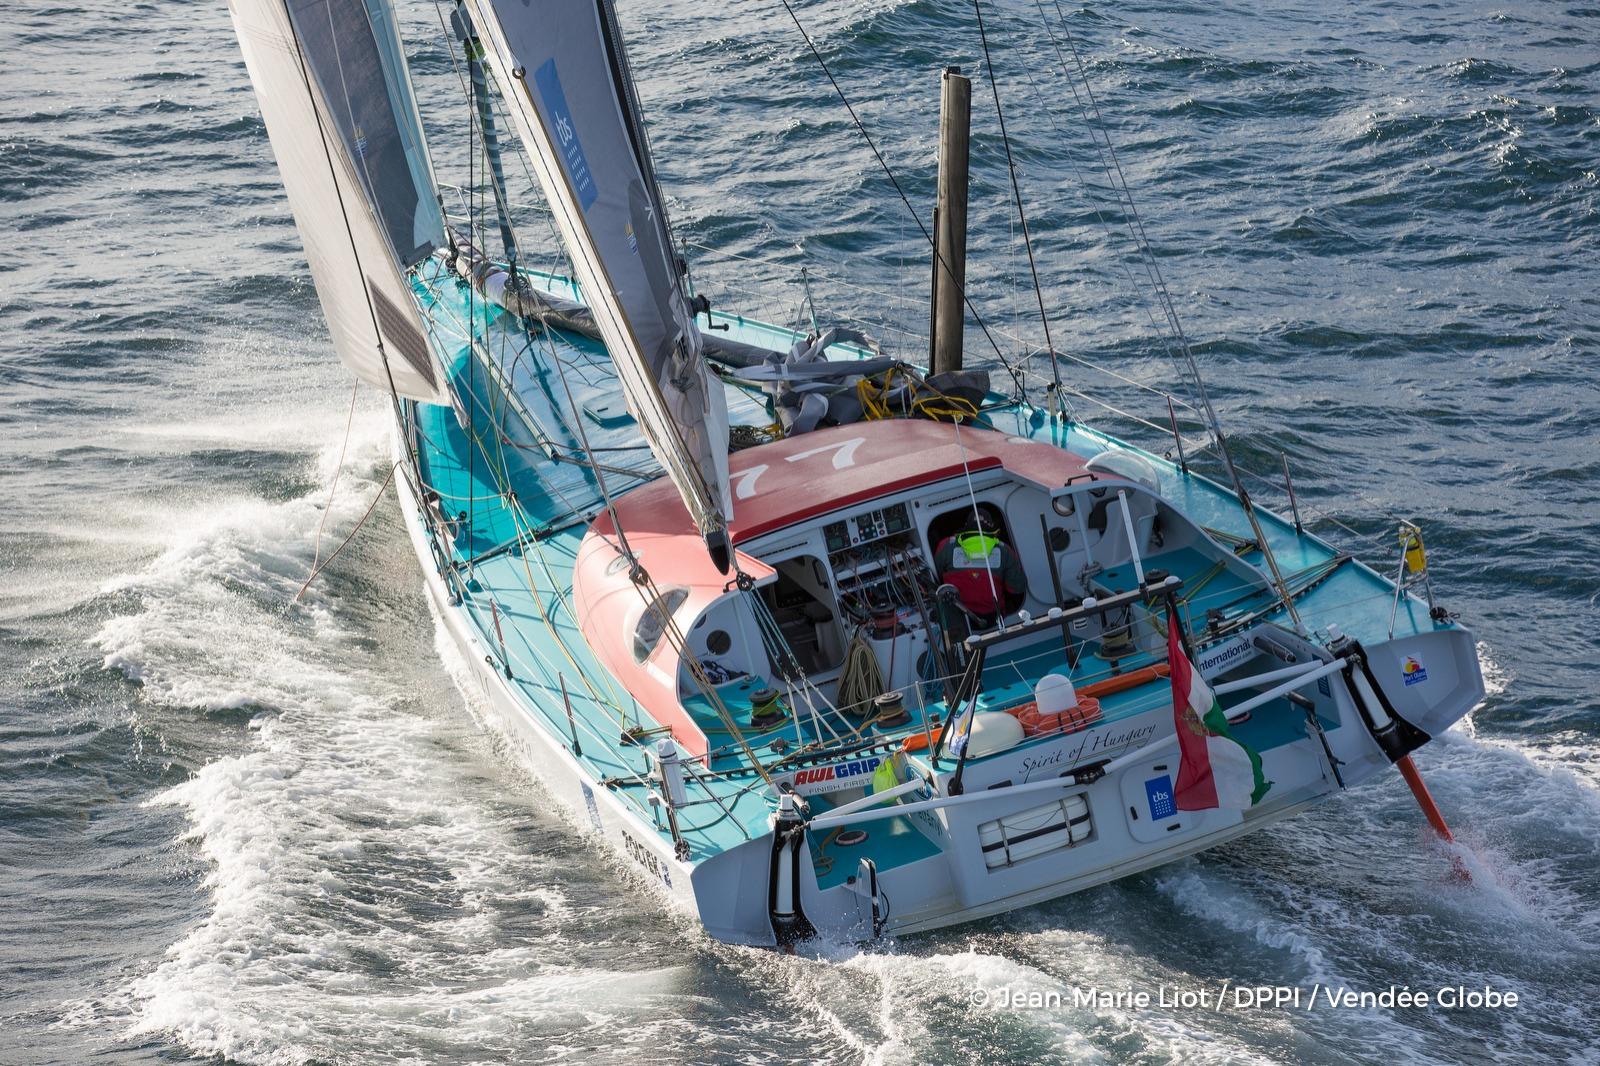 spirit-of-hungary-skipper-nandor